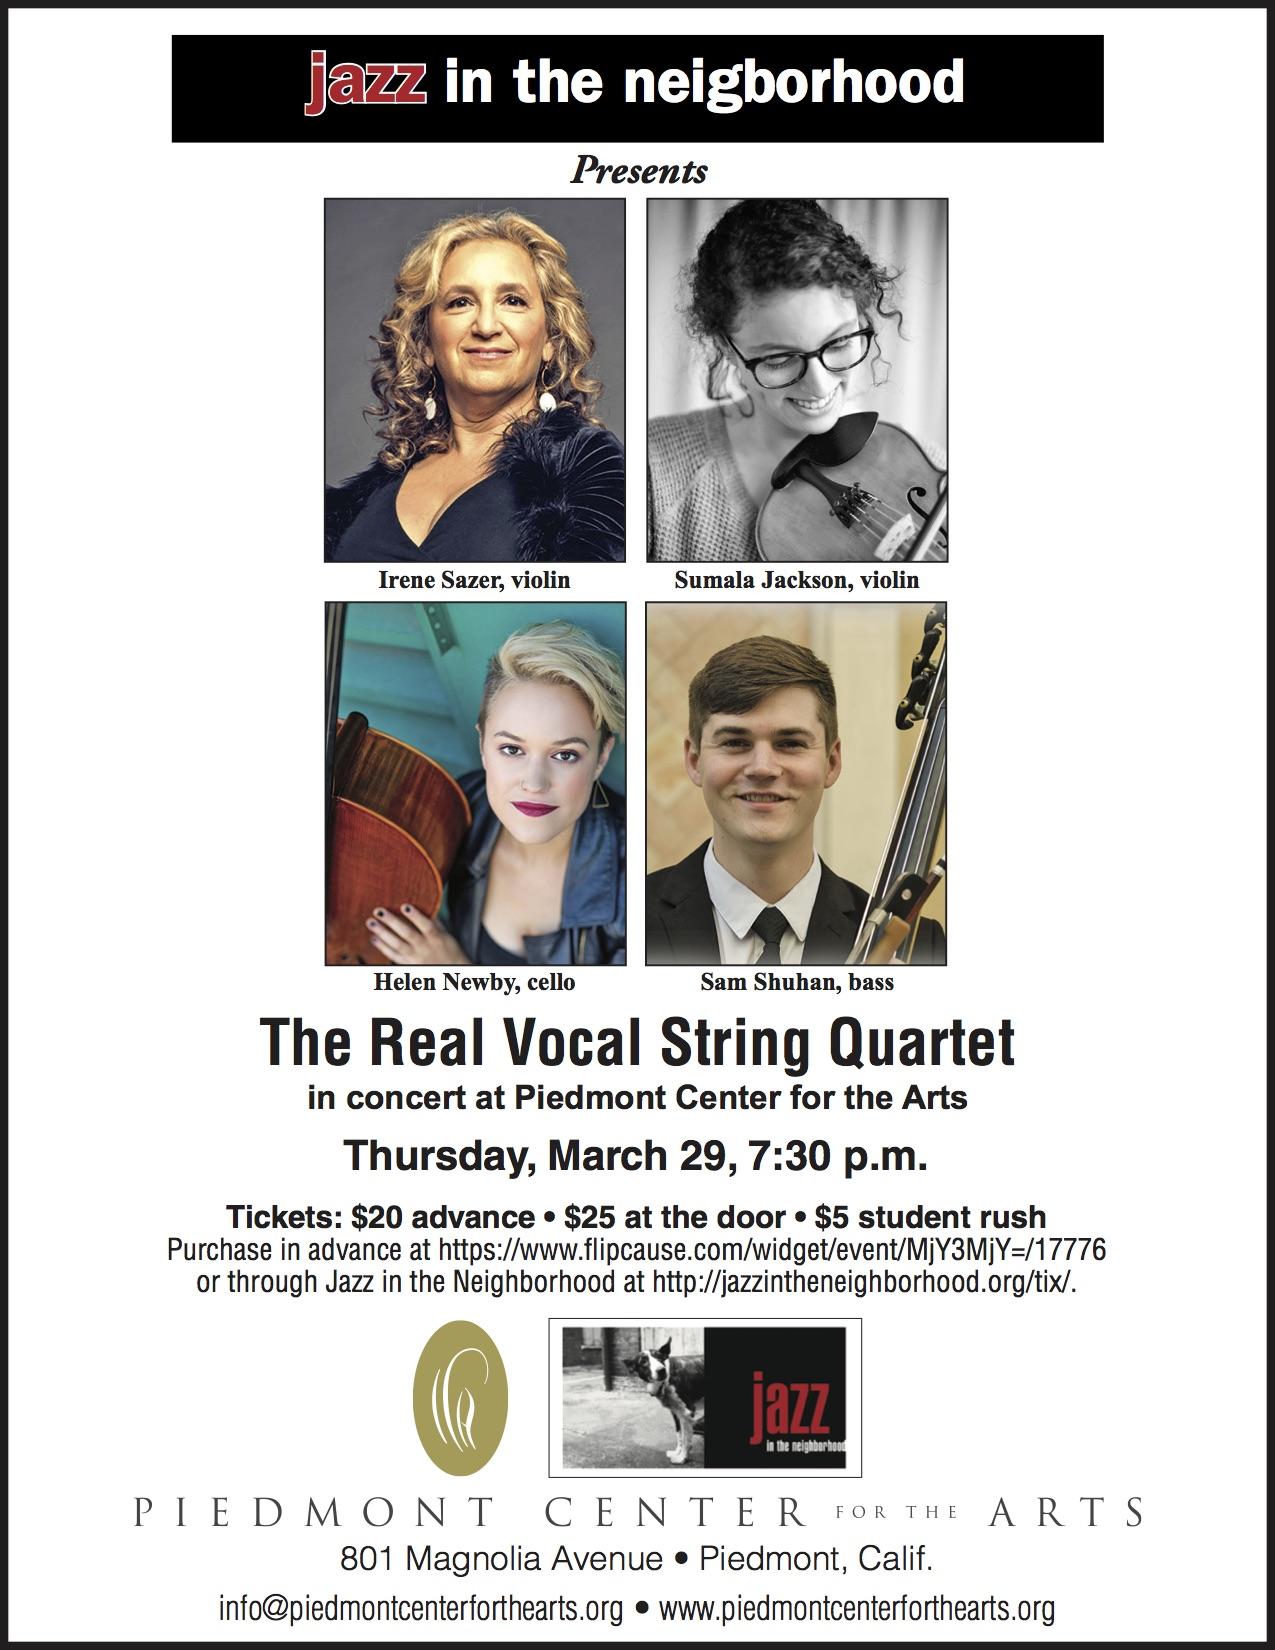 Jazz in the Neighborhood 03-28-18.jpg